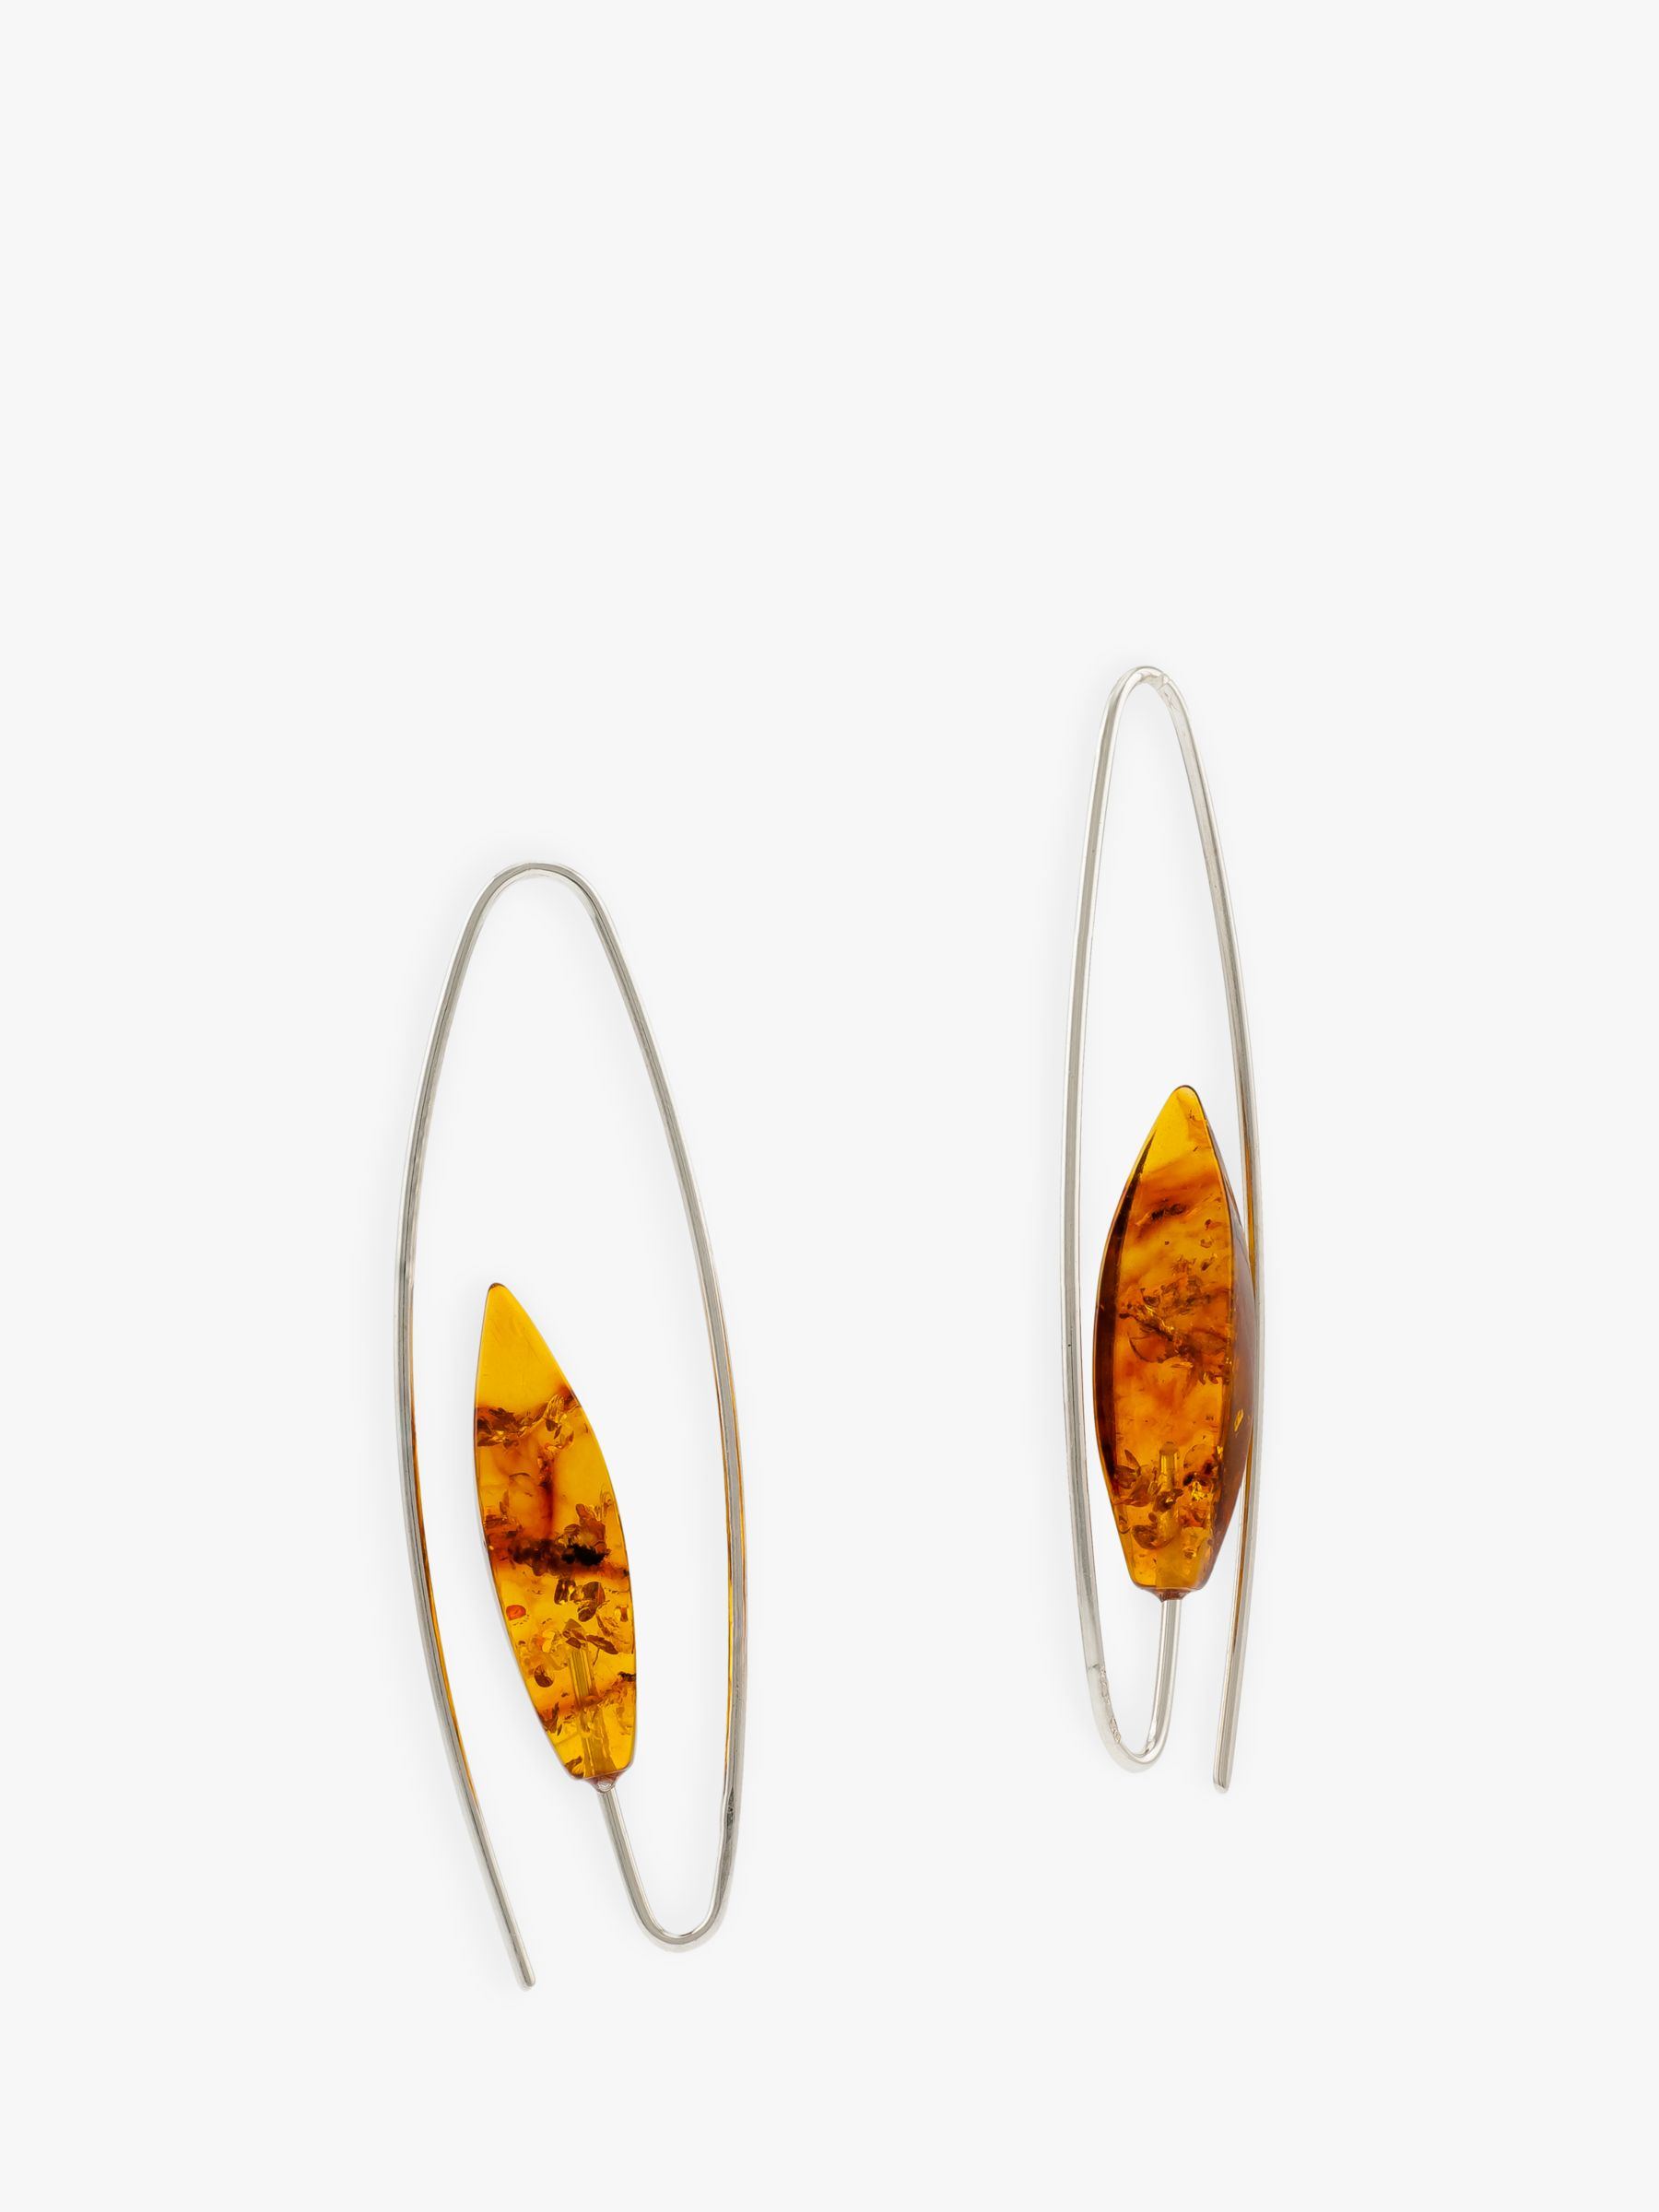 Be-Jewelled Be-Jewelled Amber Oval Hook Drop Earrings, Silver/Cognac